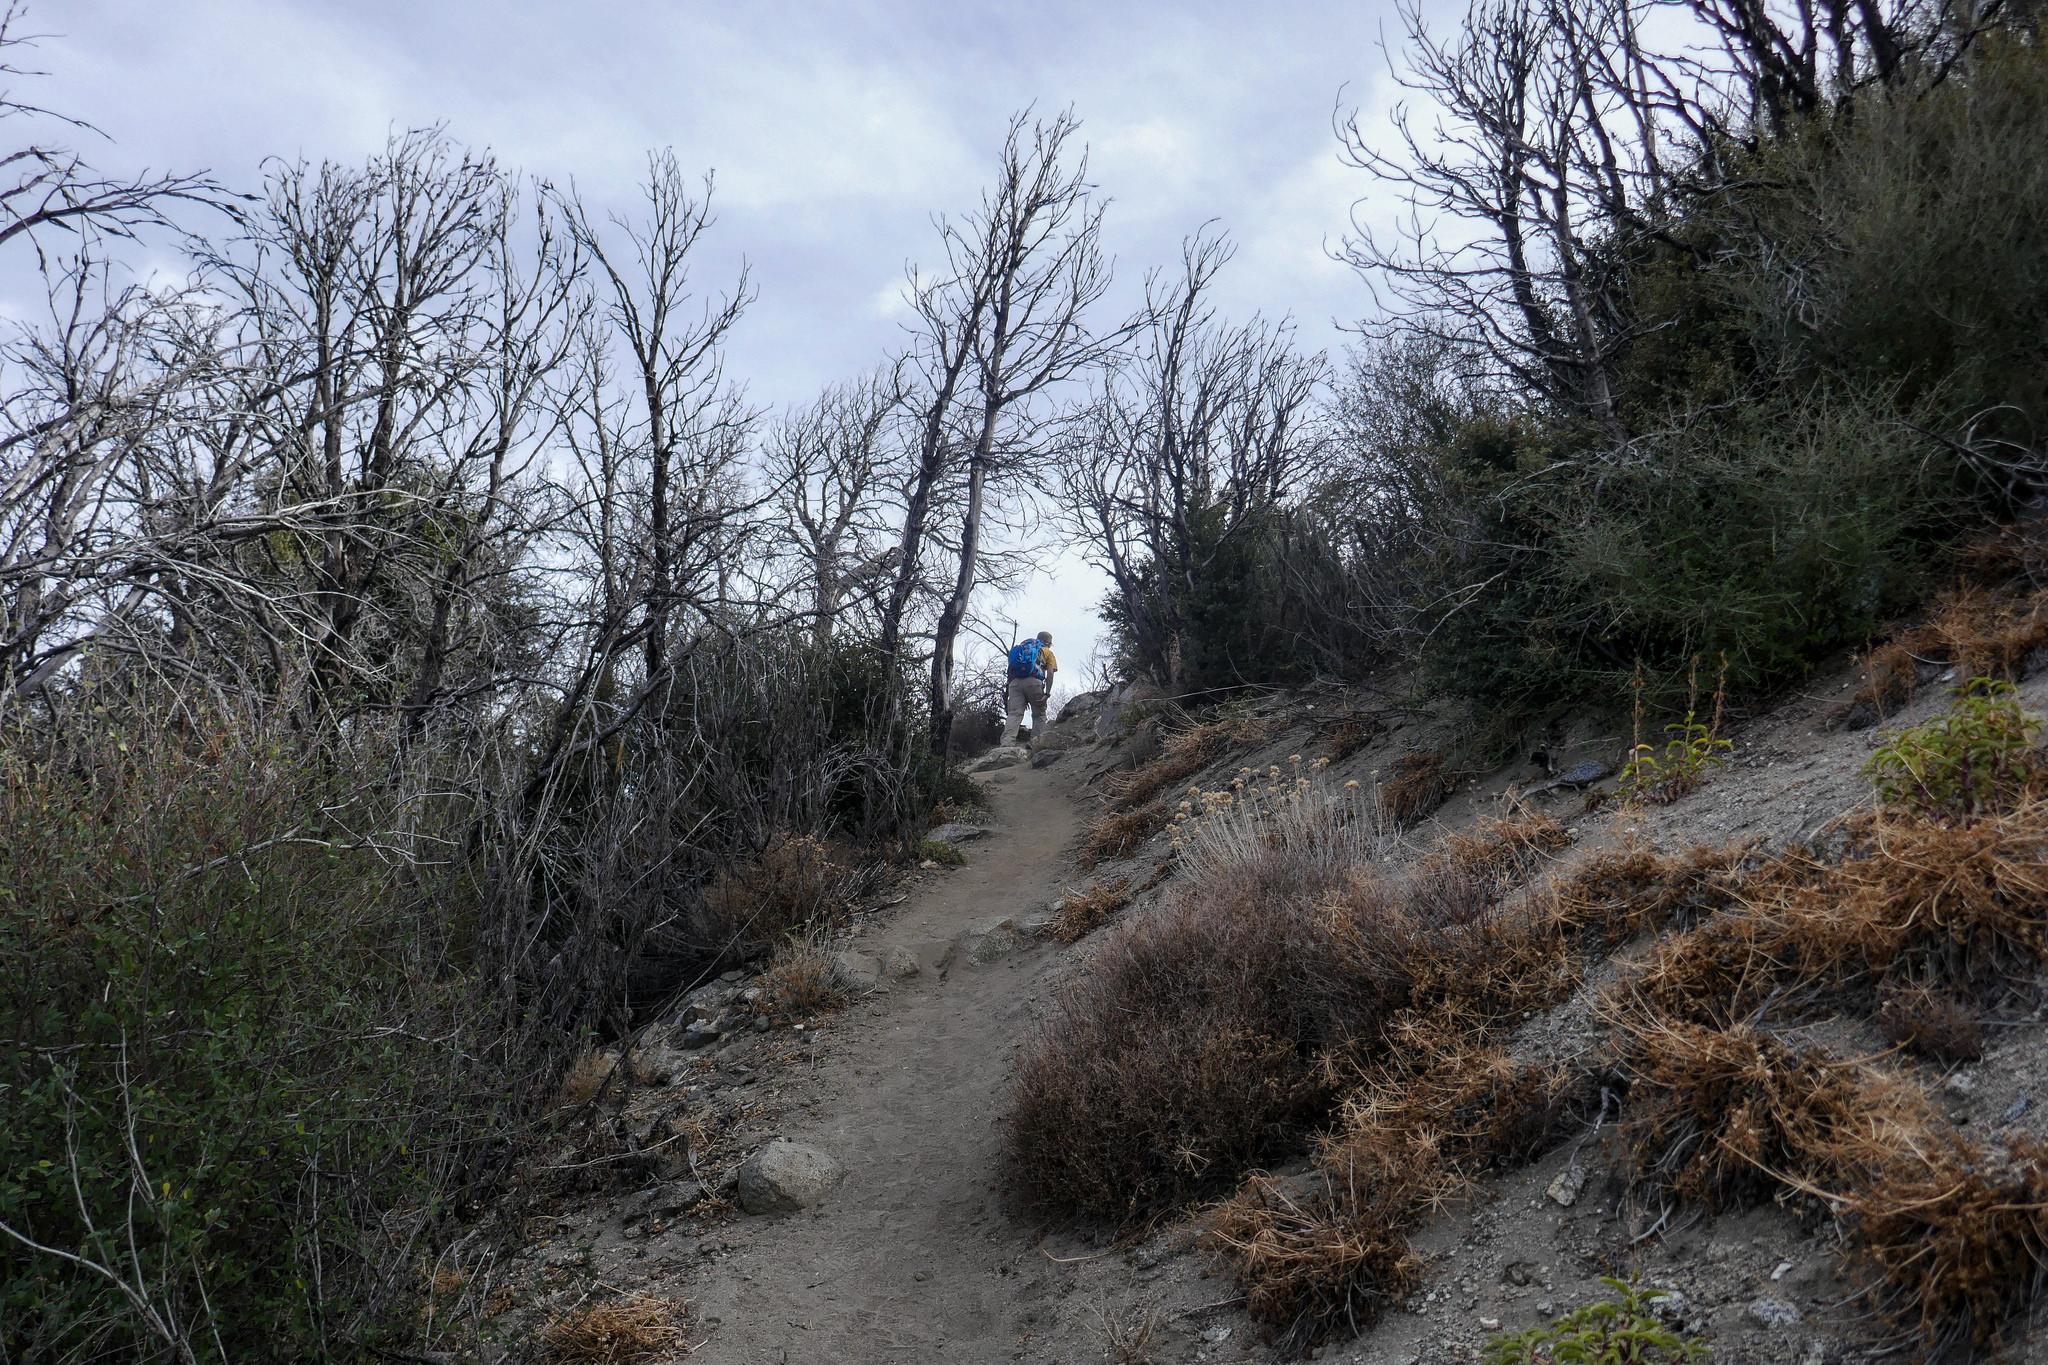 Climbing up the steep slope to San Gabriel Peak.